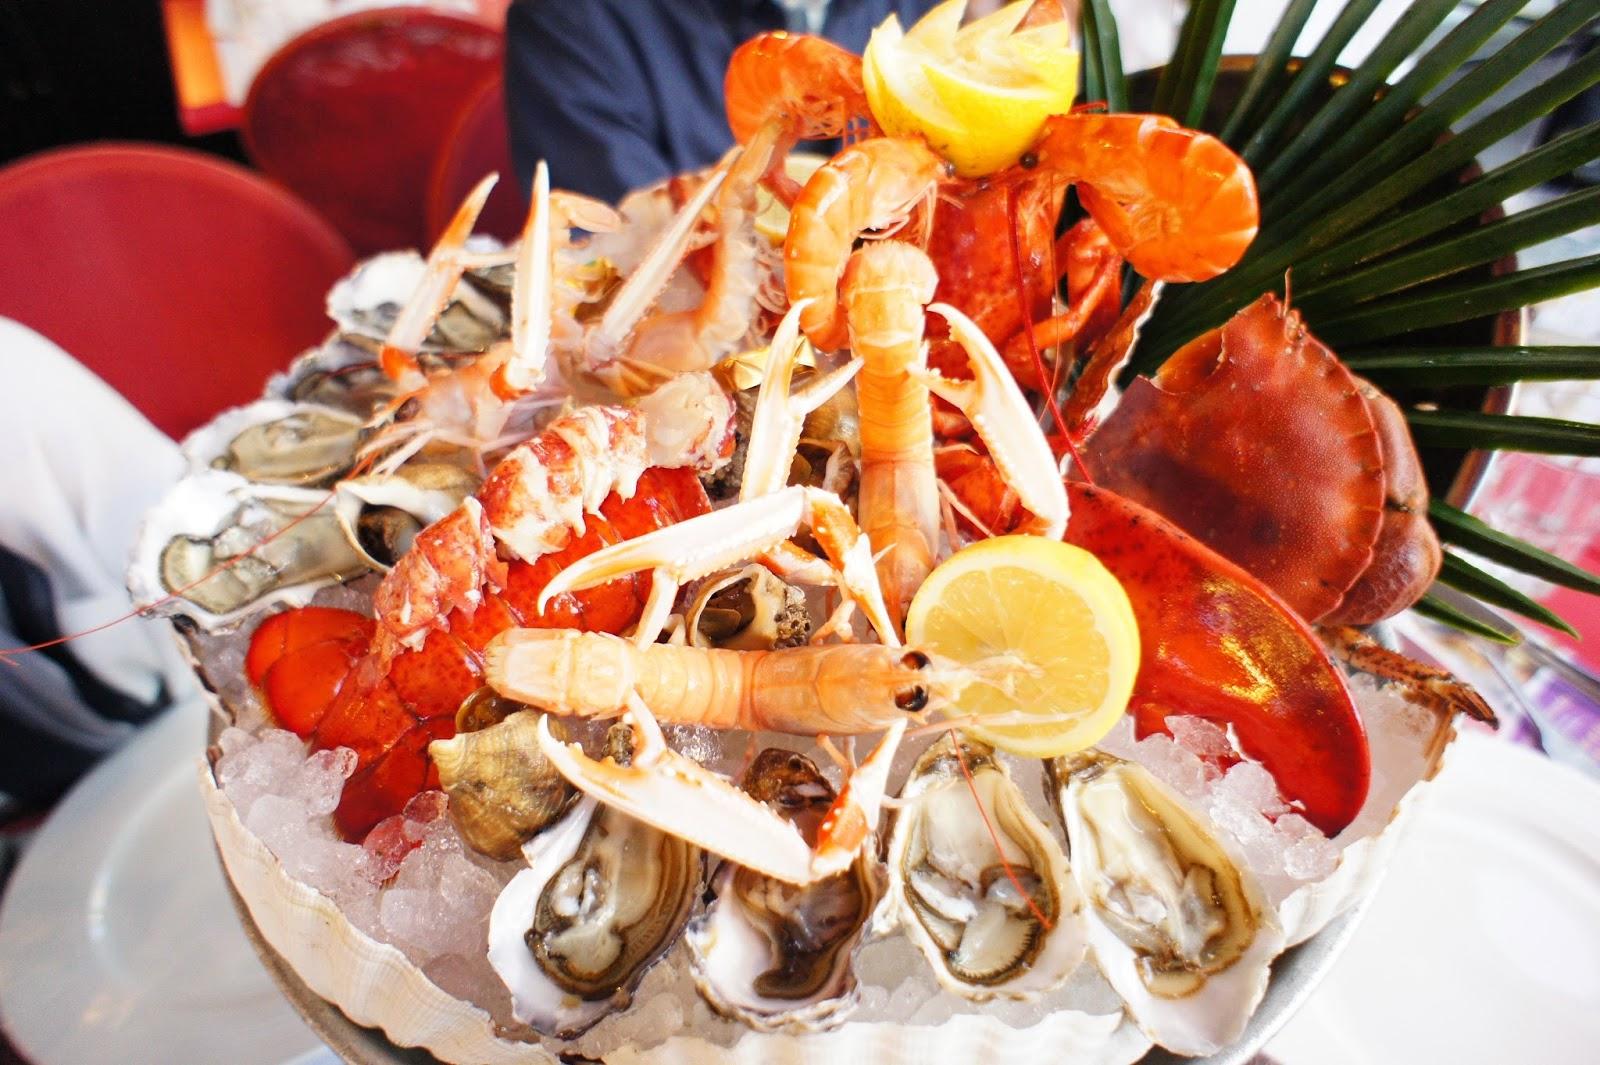 Amazing fresh seafood platter!